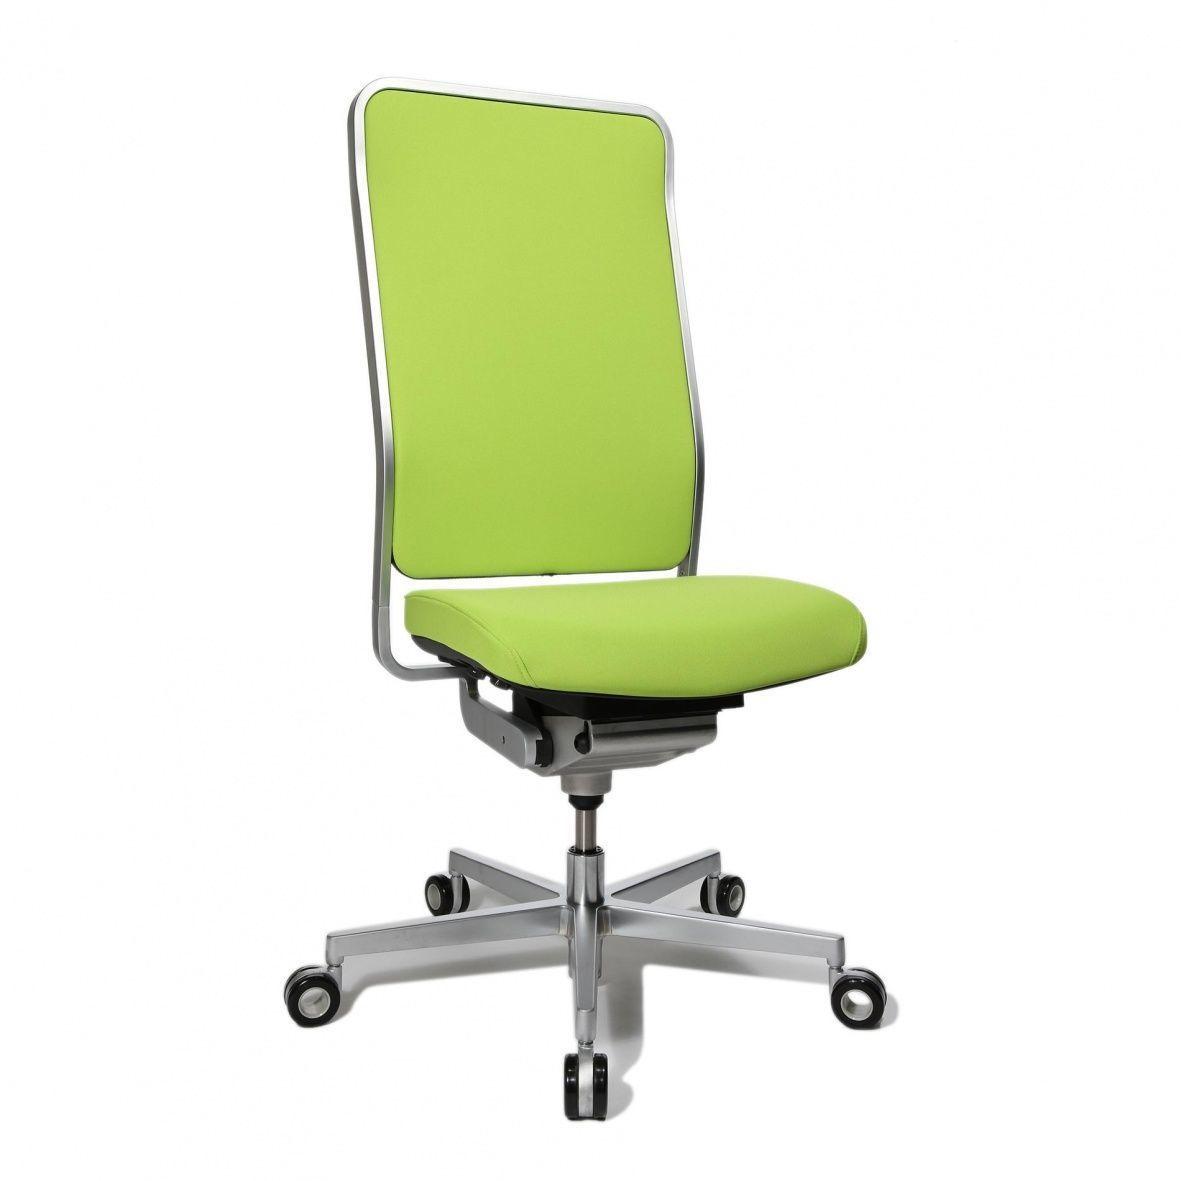 Kevi Bürostuhl w1 high bürostuhl wagner ambientedirect com